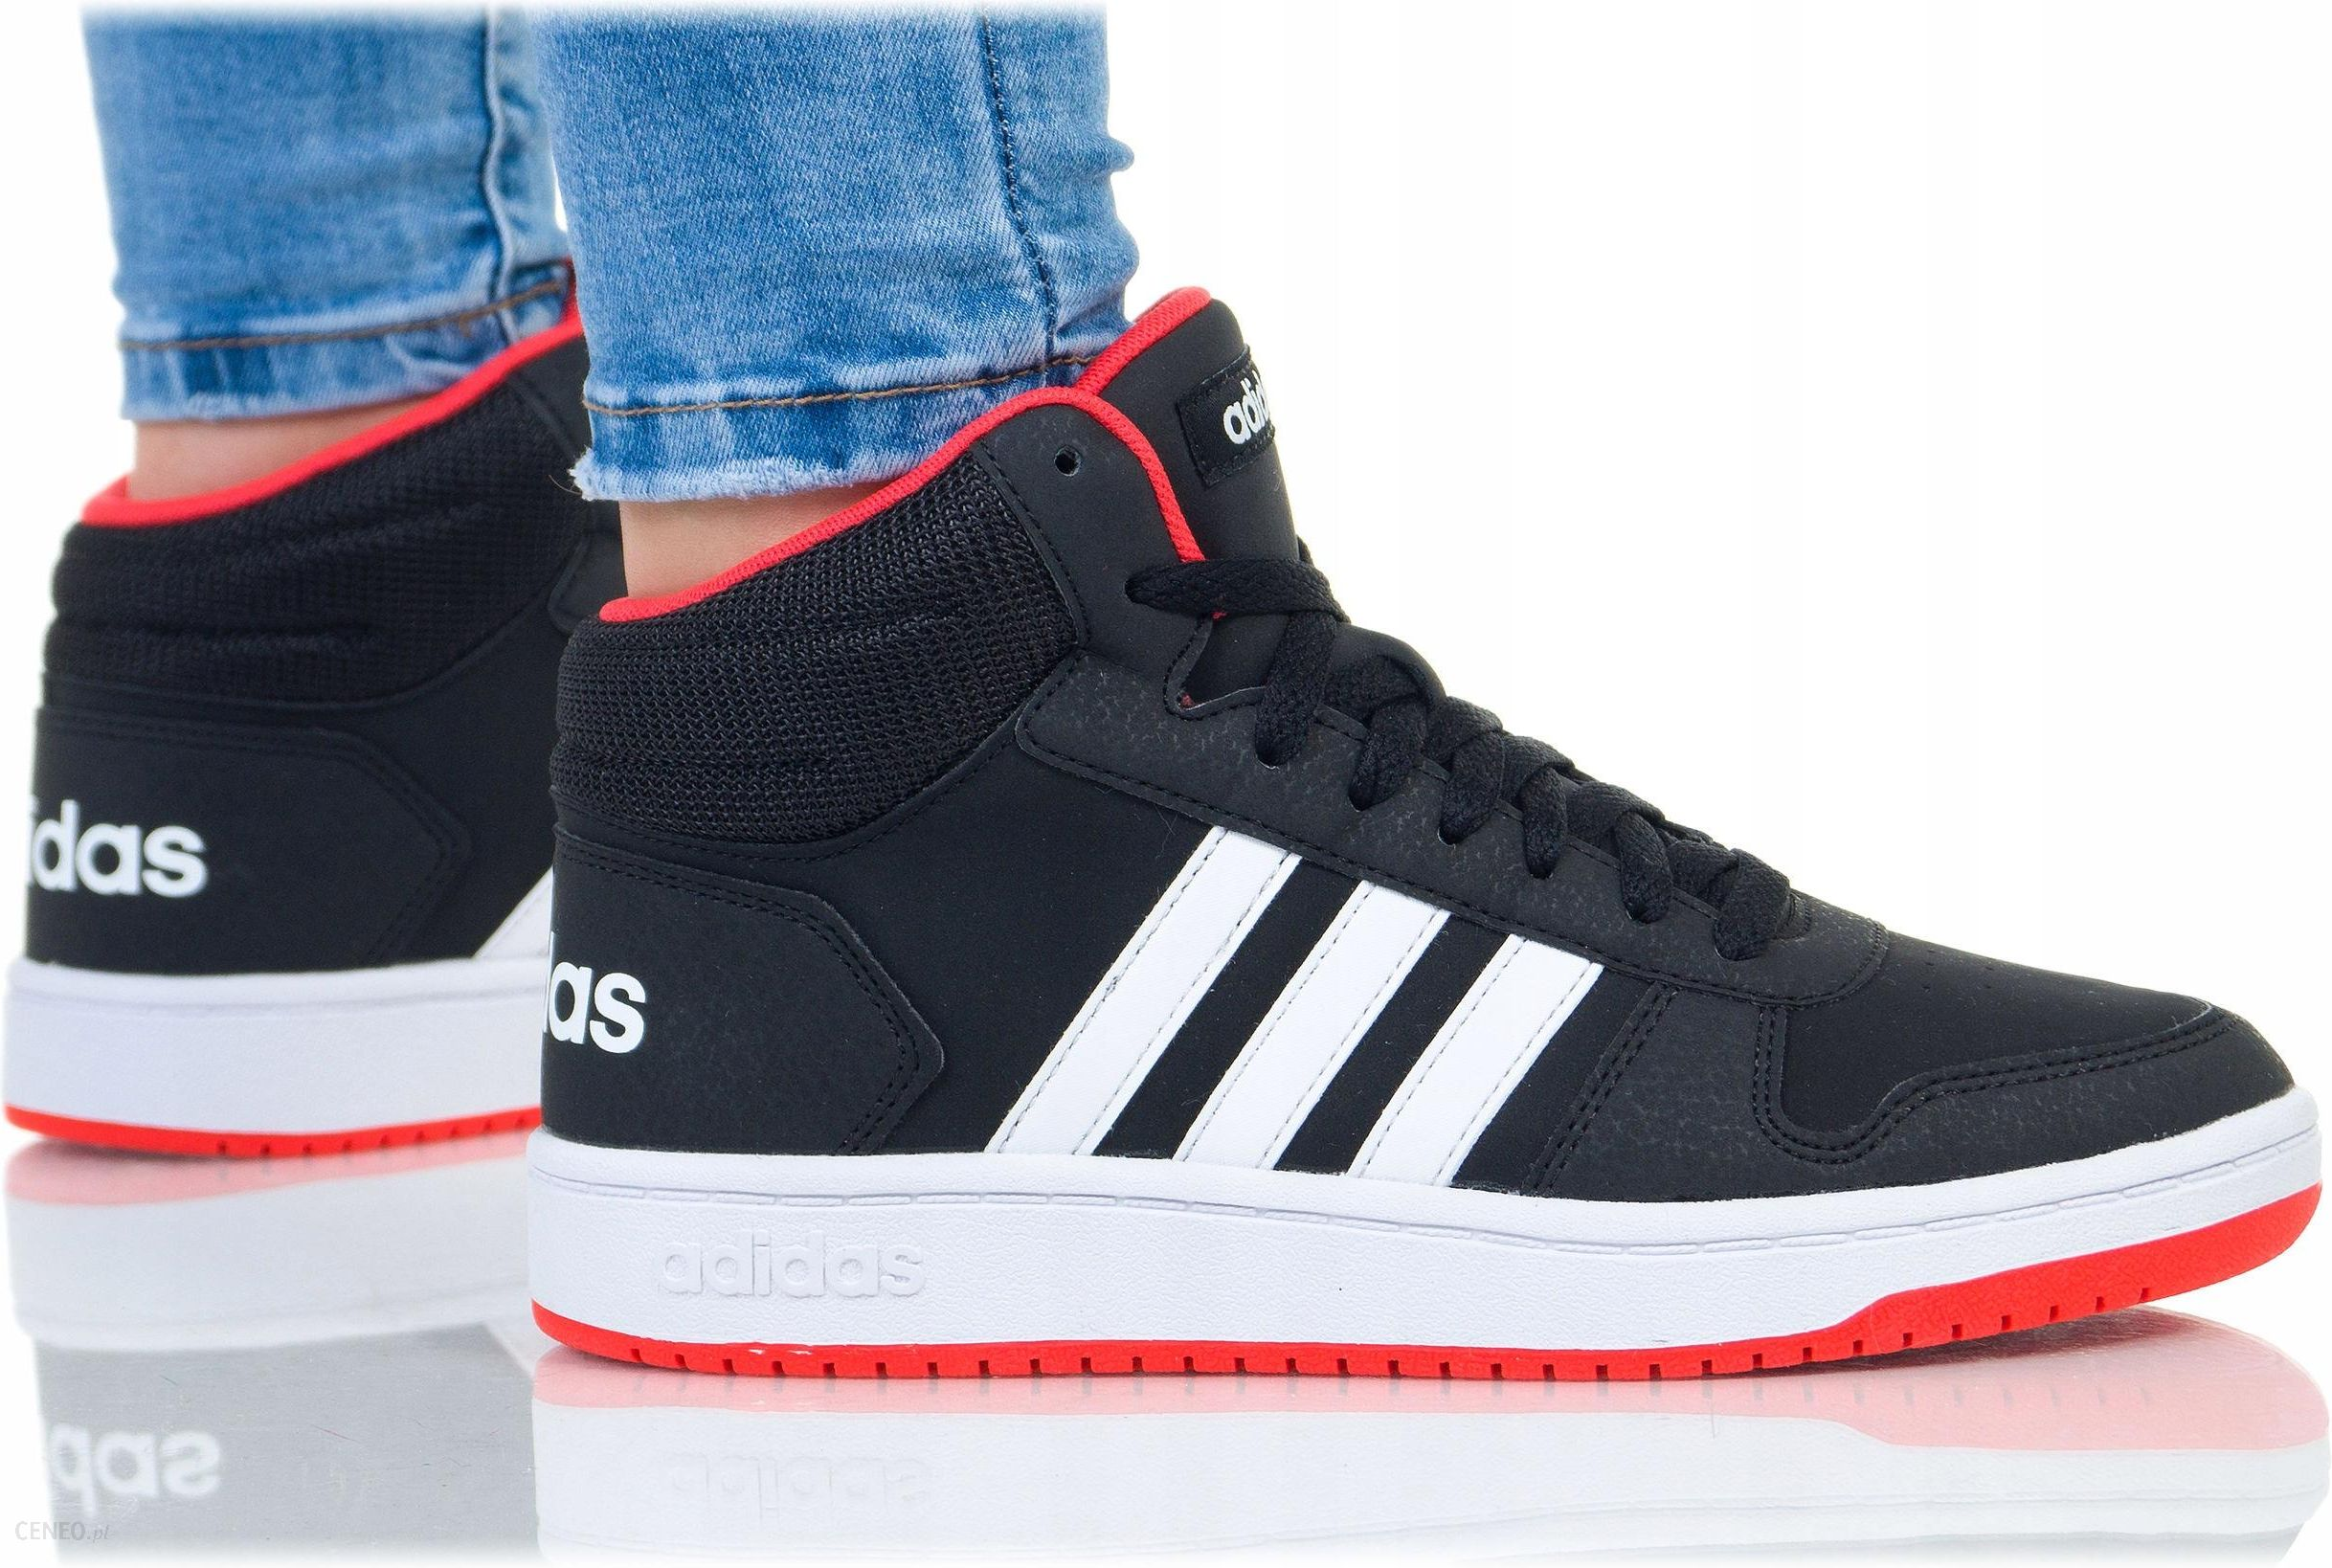 Buty Adidas Hoops MID 2.0 K B75743 R. 39 13 Ceny i opinie Ceneo.pl